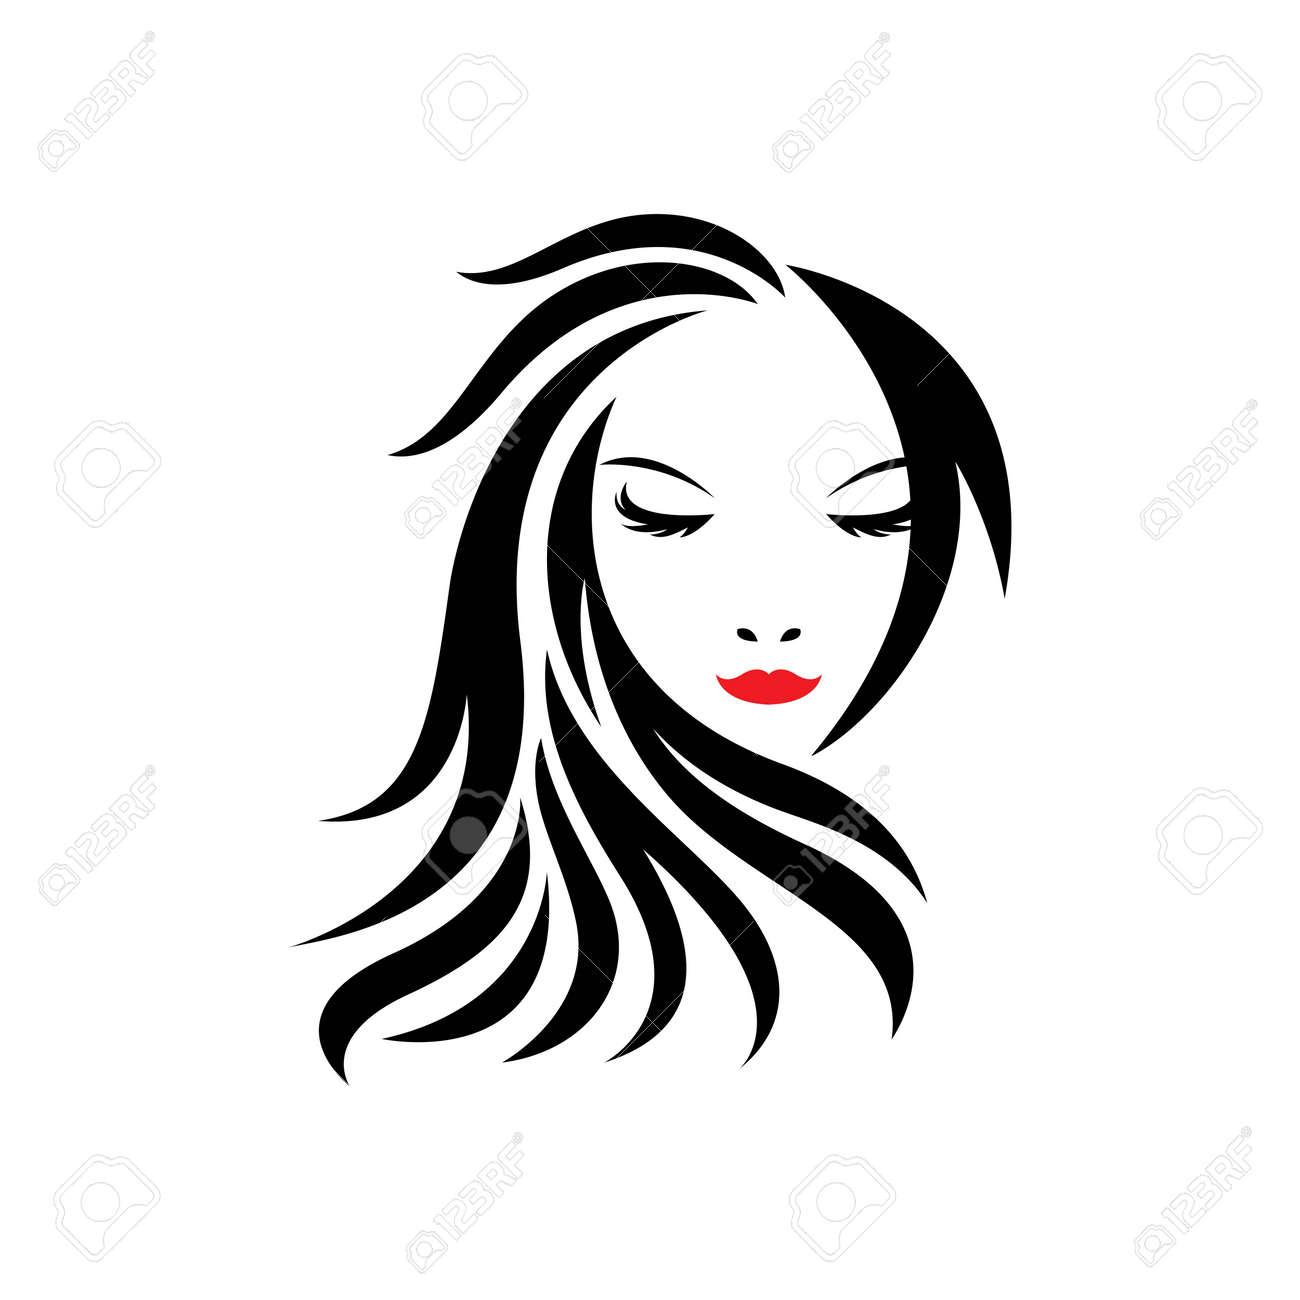 Beauty hair and salon logo images illustration design - 173289132